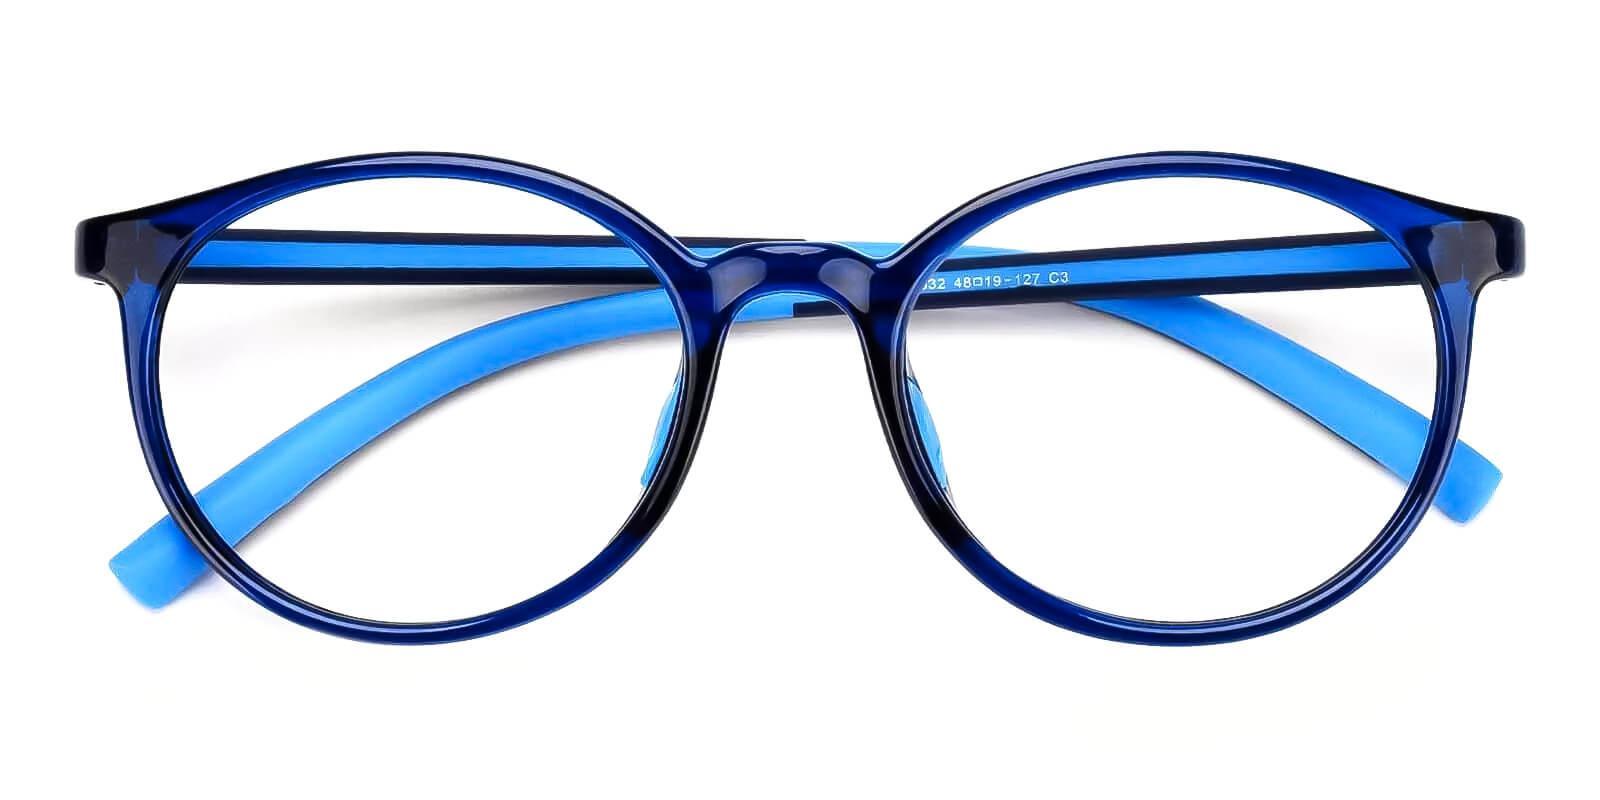 Kids-Momentous Blue Plastic Eyeglasses , Fashion , UniversalBridgeFit Frames from ABBE Glasses